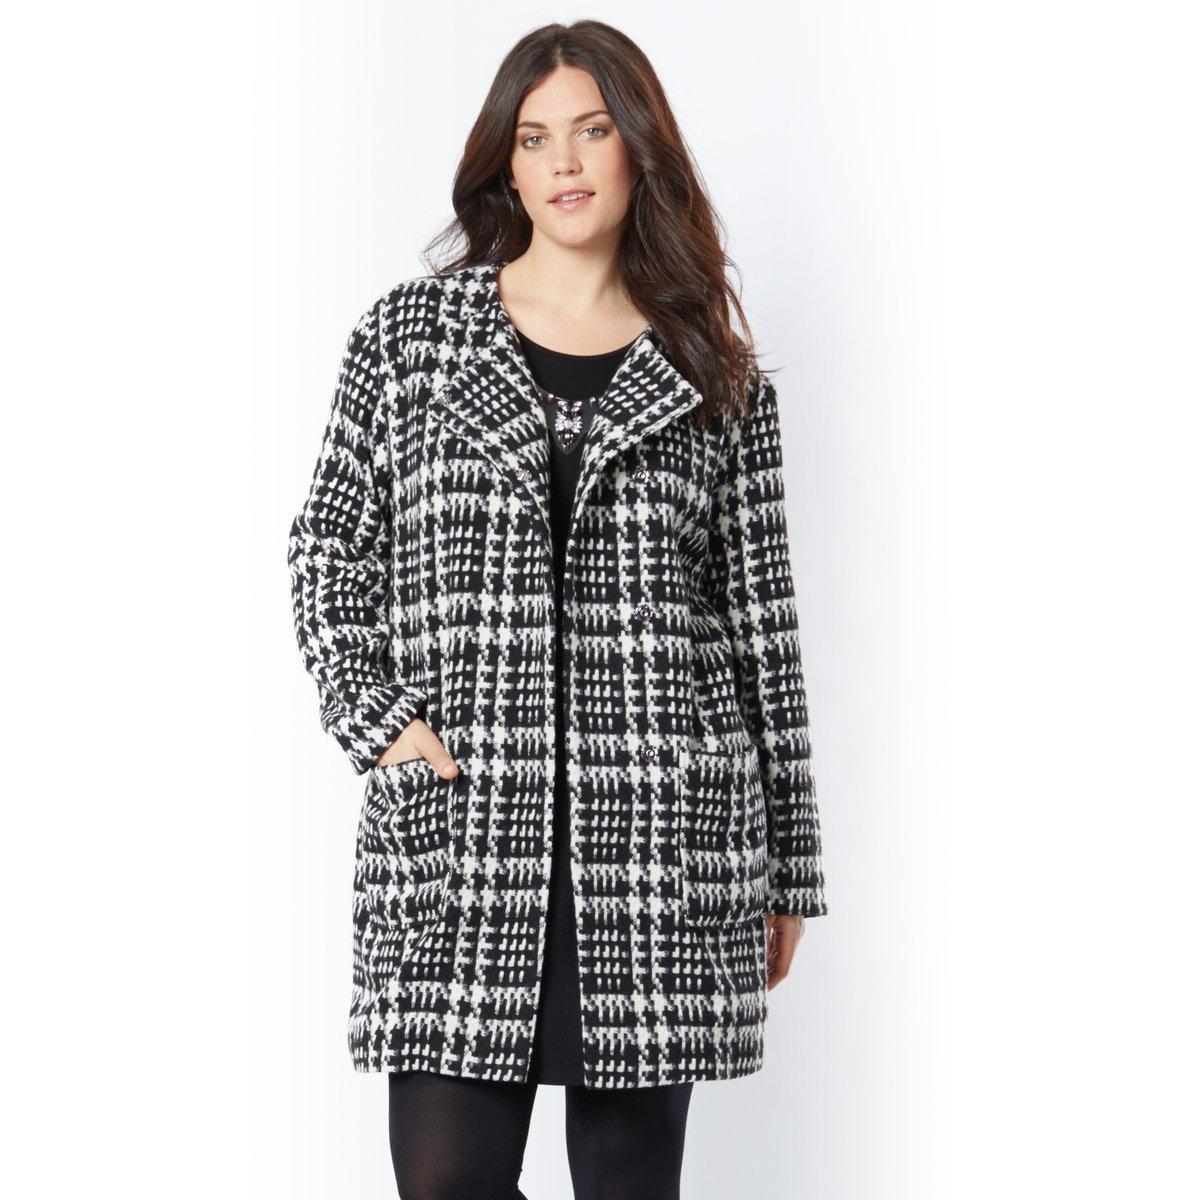 Пальто прямого покроя<br><br>Цвет: узор куриная лапка<br>Размер: 42 (FR) - 48 (RUS)